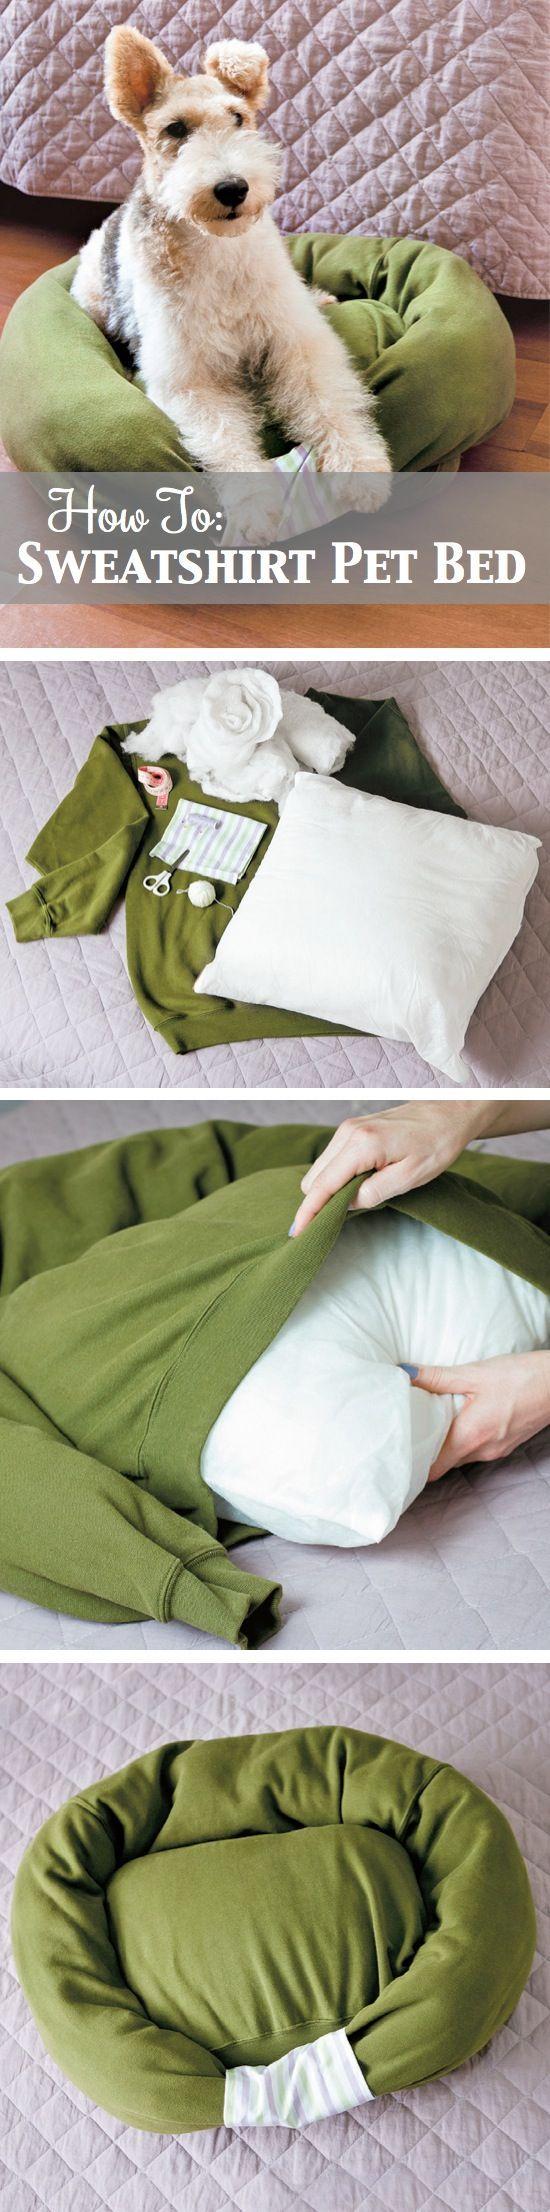 hundebett aus pullover hund pinterest hundebett pullover und hunde. Black Bedroom Furniture Sets. Home Design Ideas